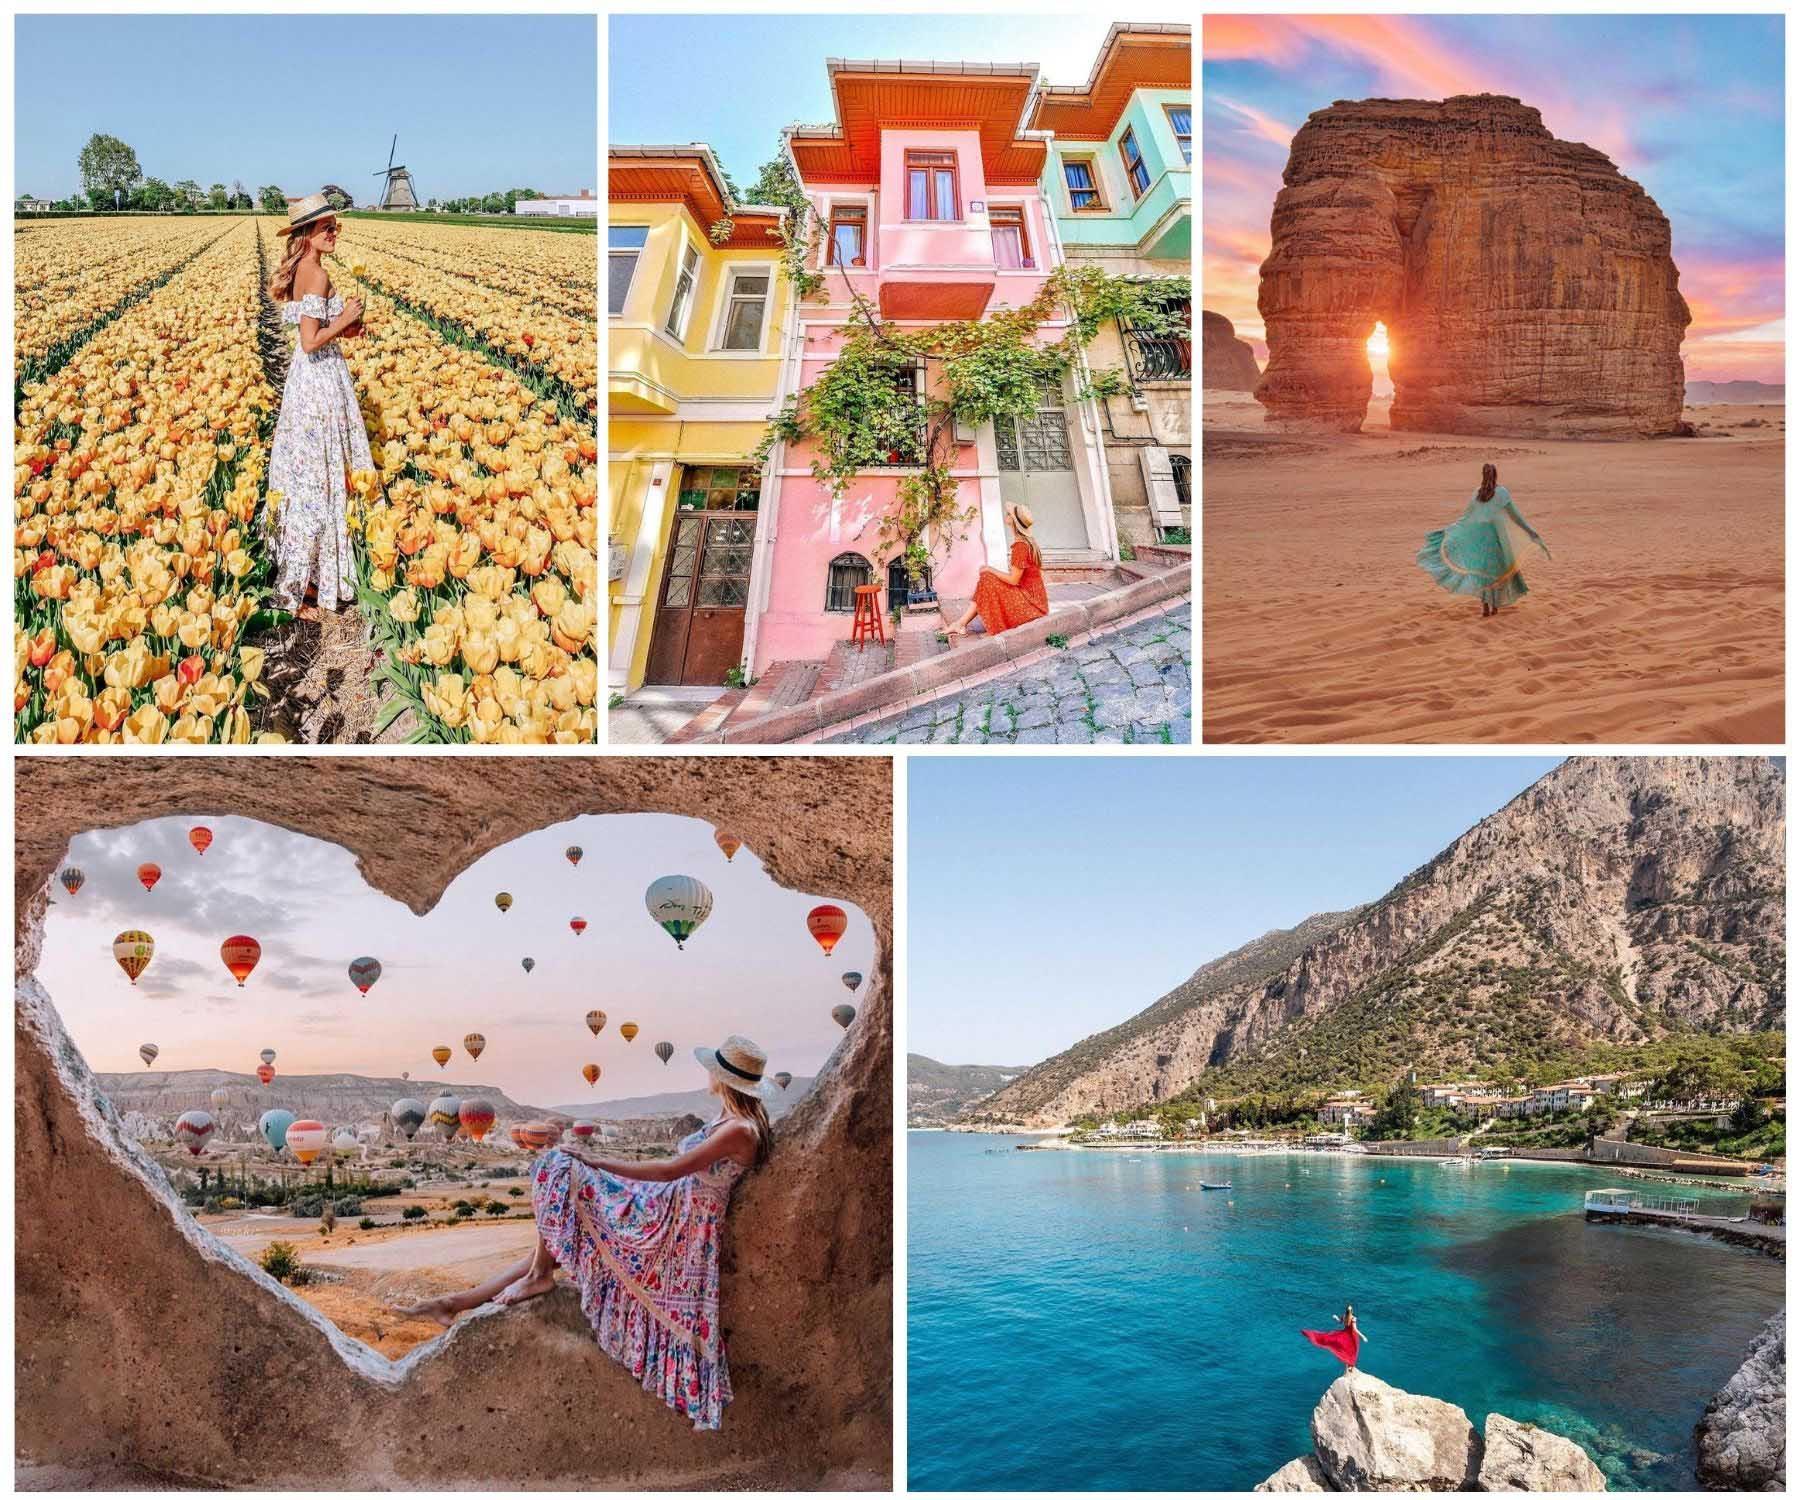 tài khoản instagram du lịch izkiz